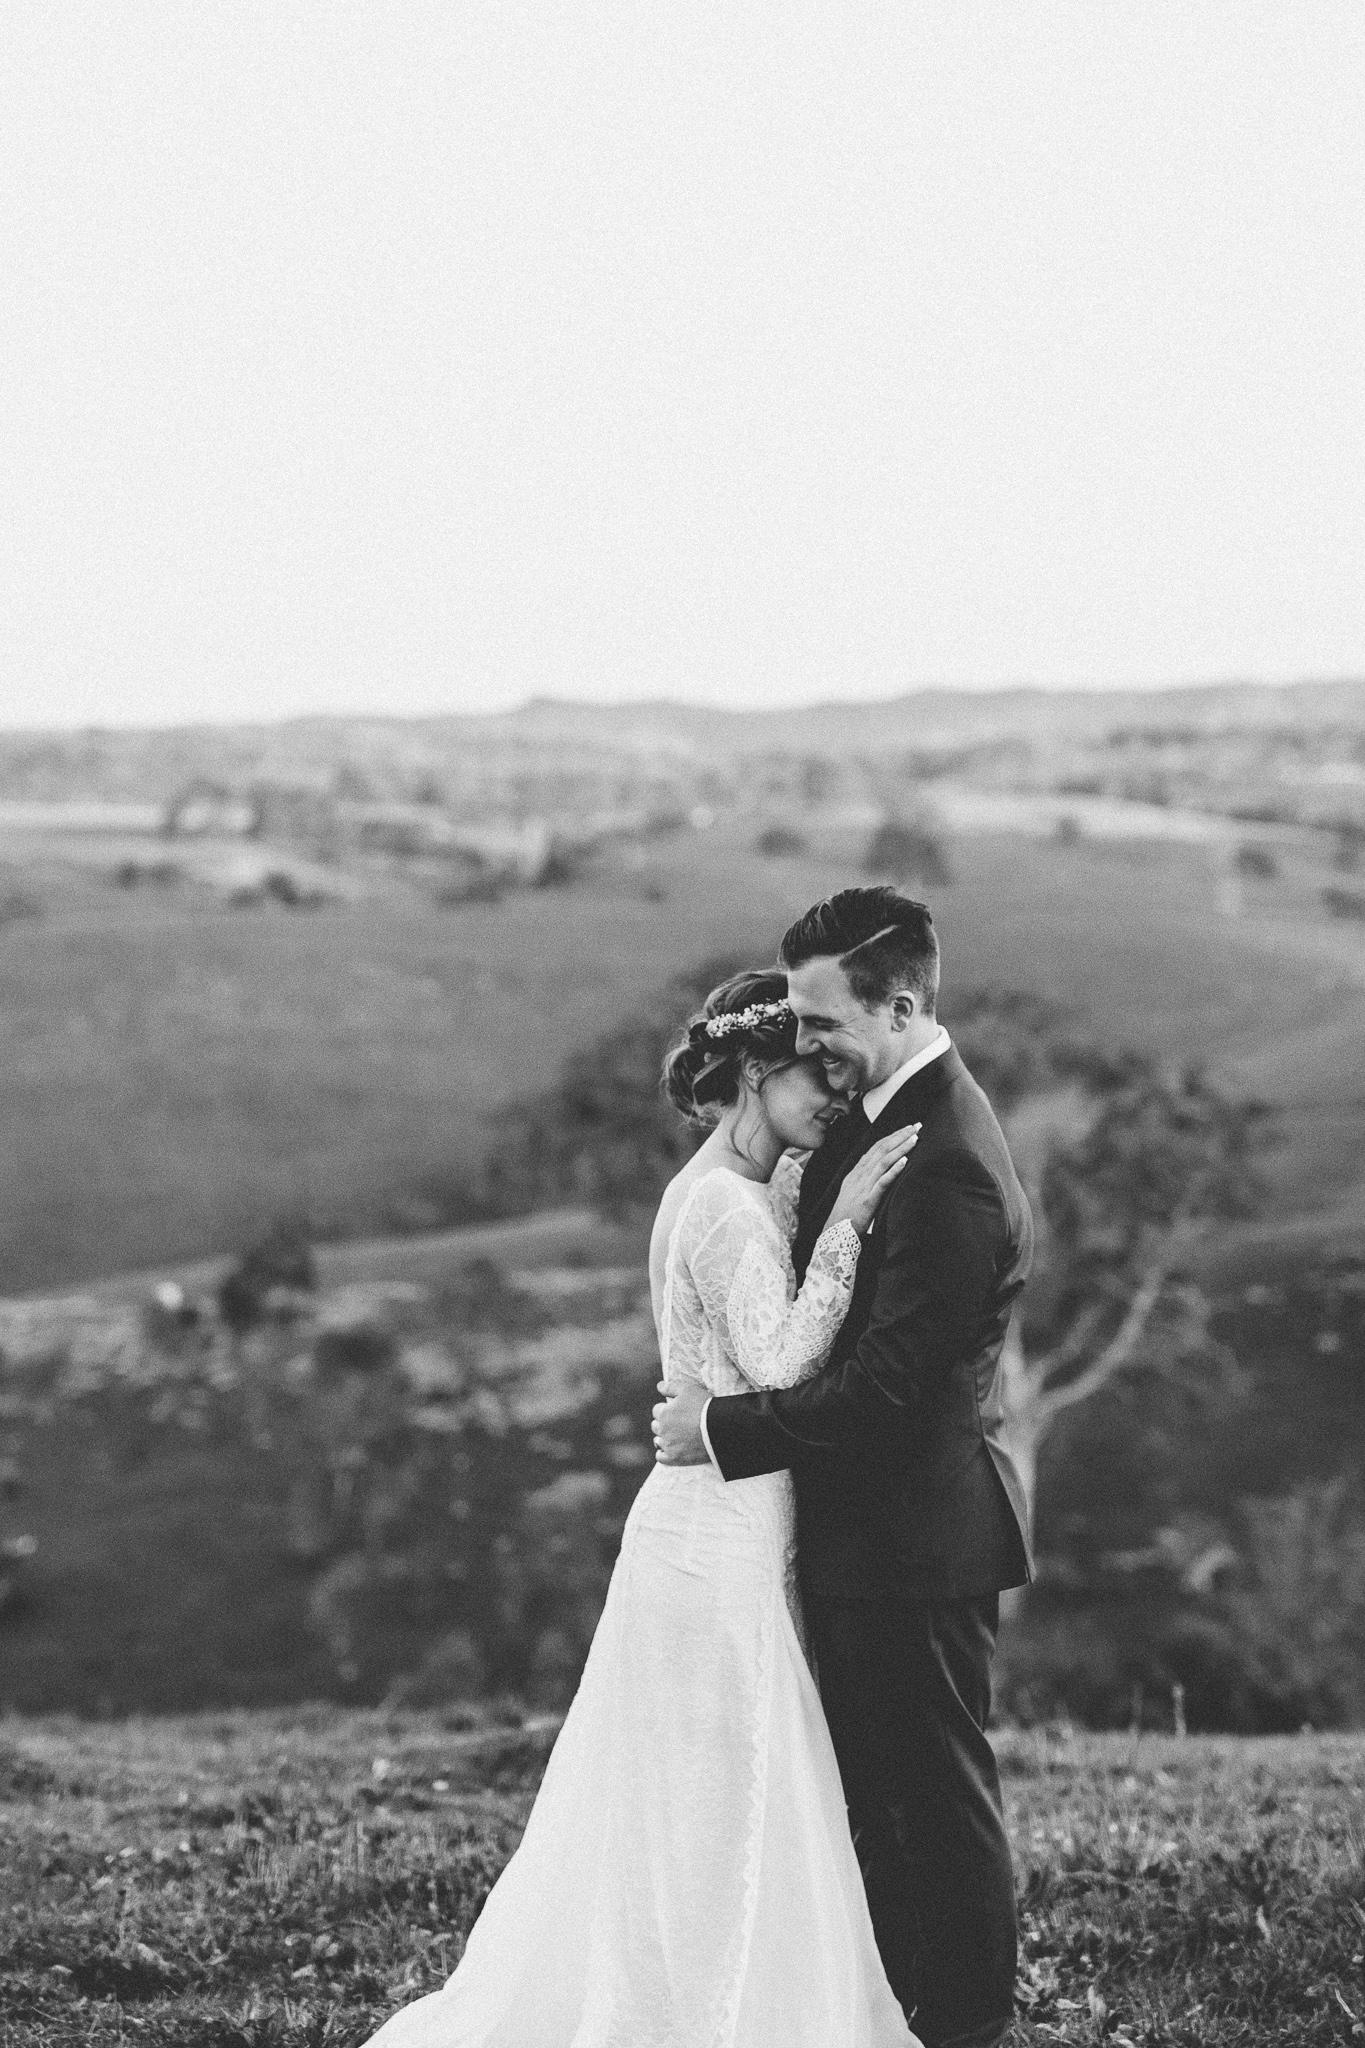 christopher morrison_adelaide hills wedding_ andy + teegan_84_1044.jpg